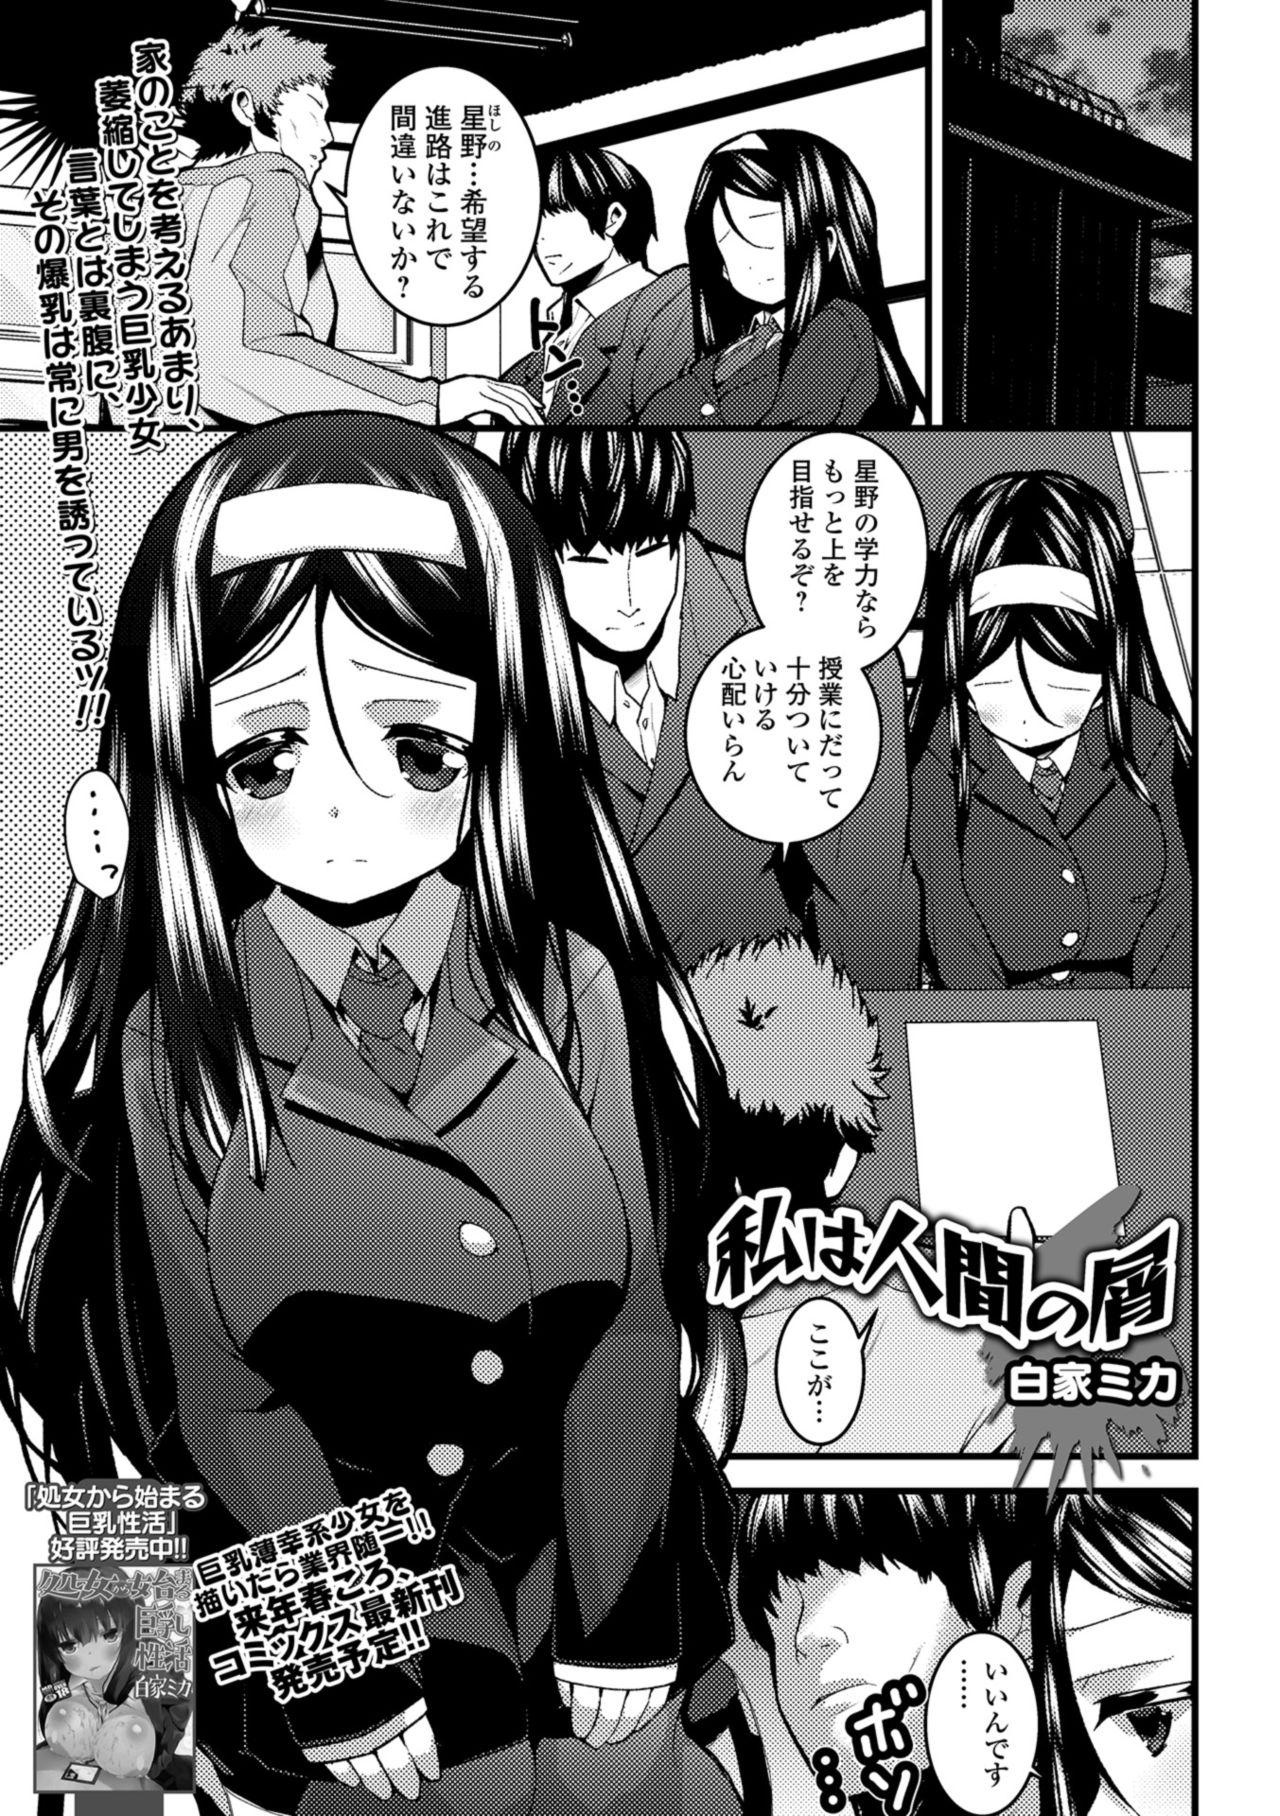 COMIC Shigekiteki SQUIRT!! Vol. 09 180